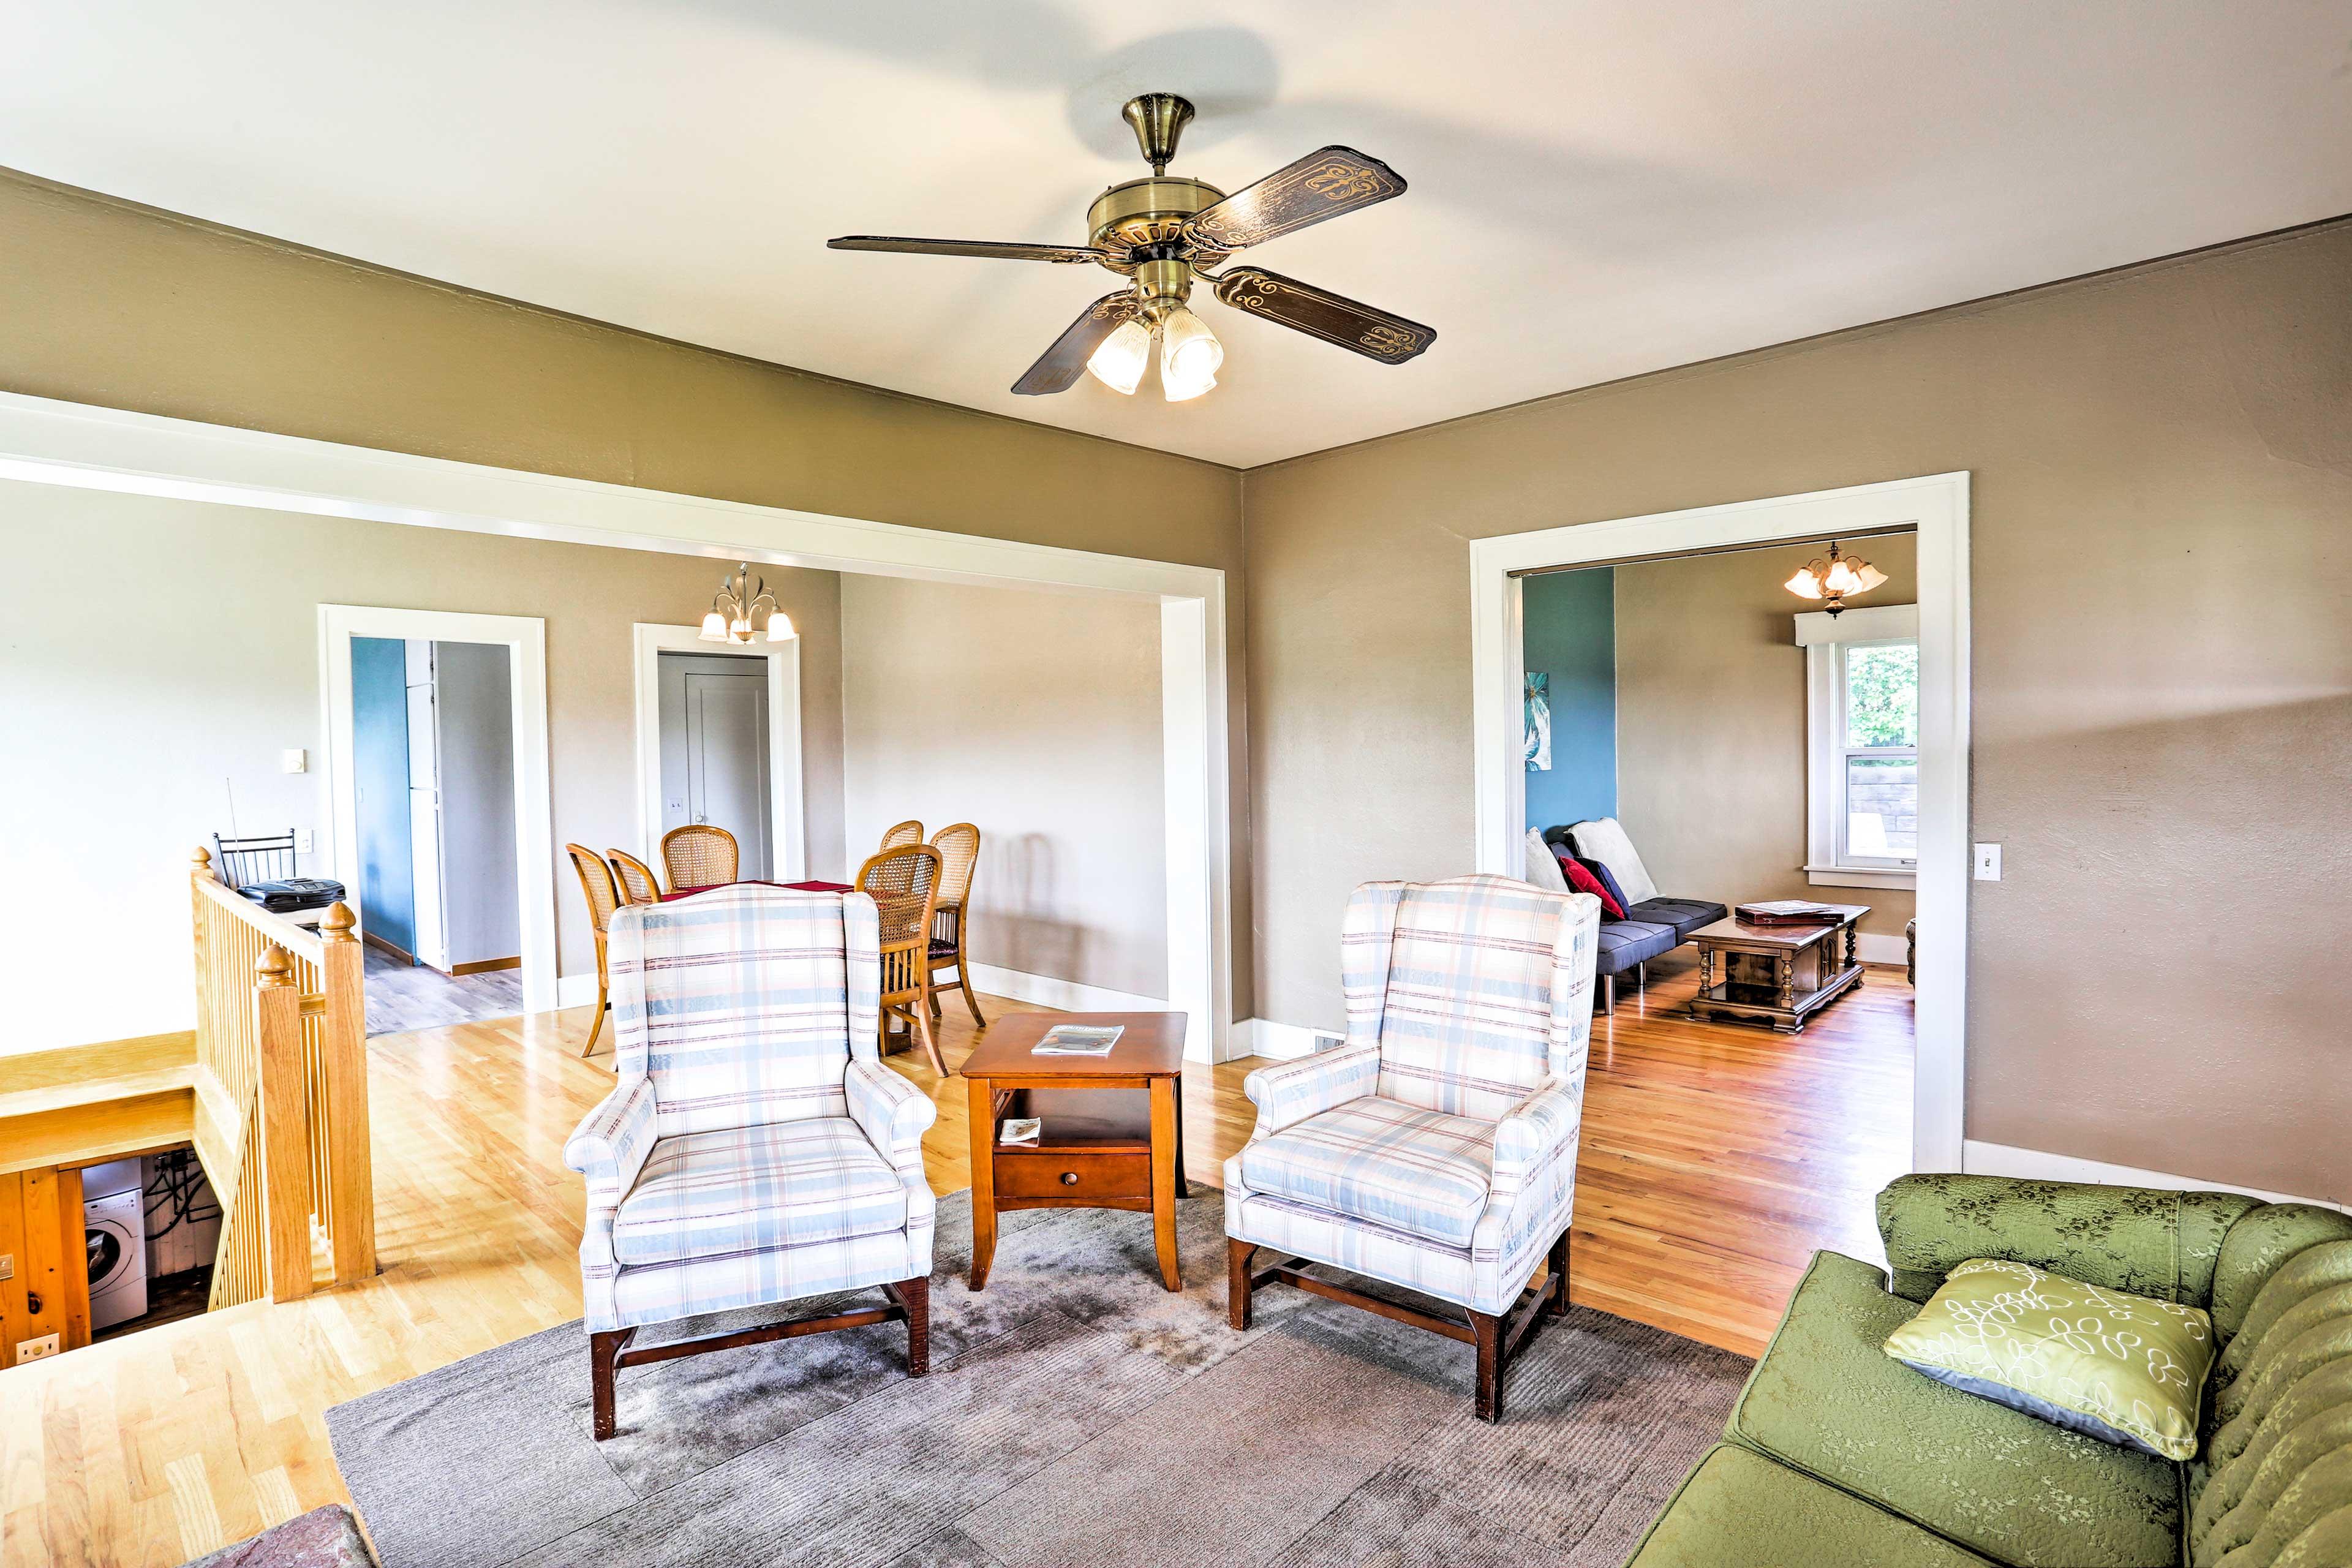 Cozy furnishings line the comfortable interior.